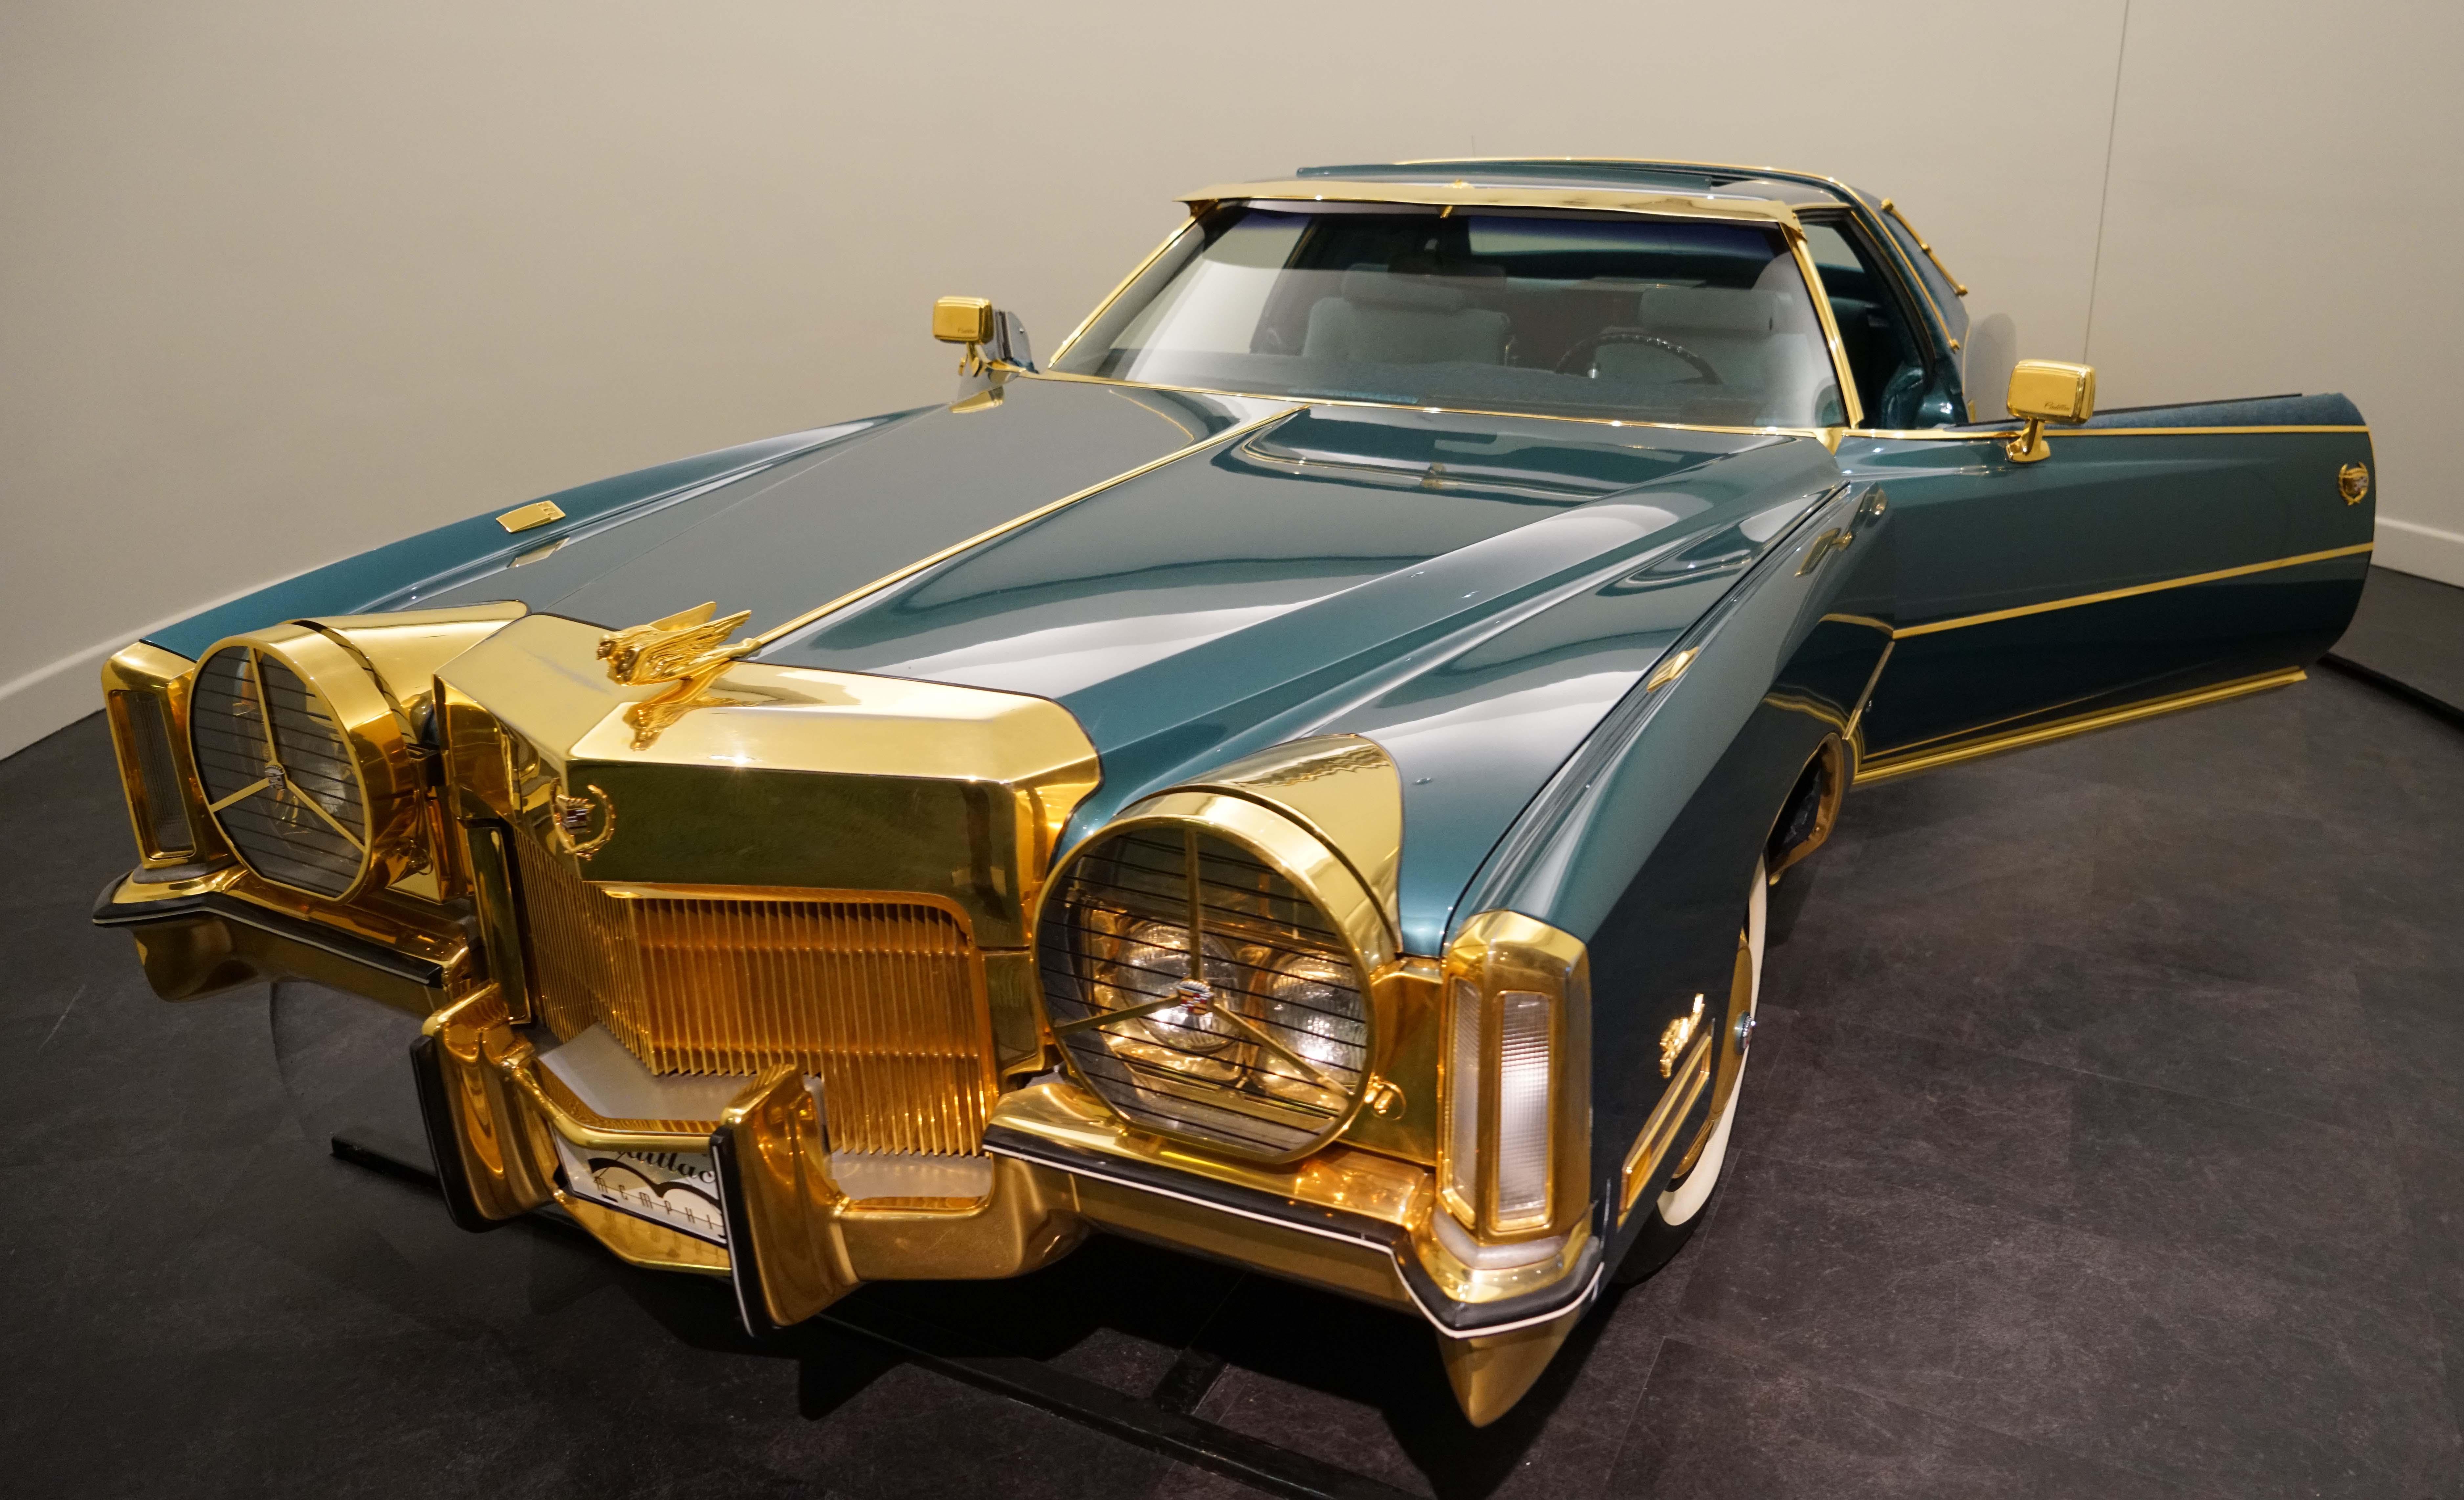 MemphisTennesseeStaxMuseumJune2019-9BLOG